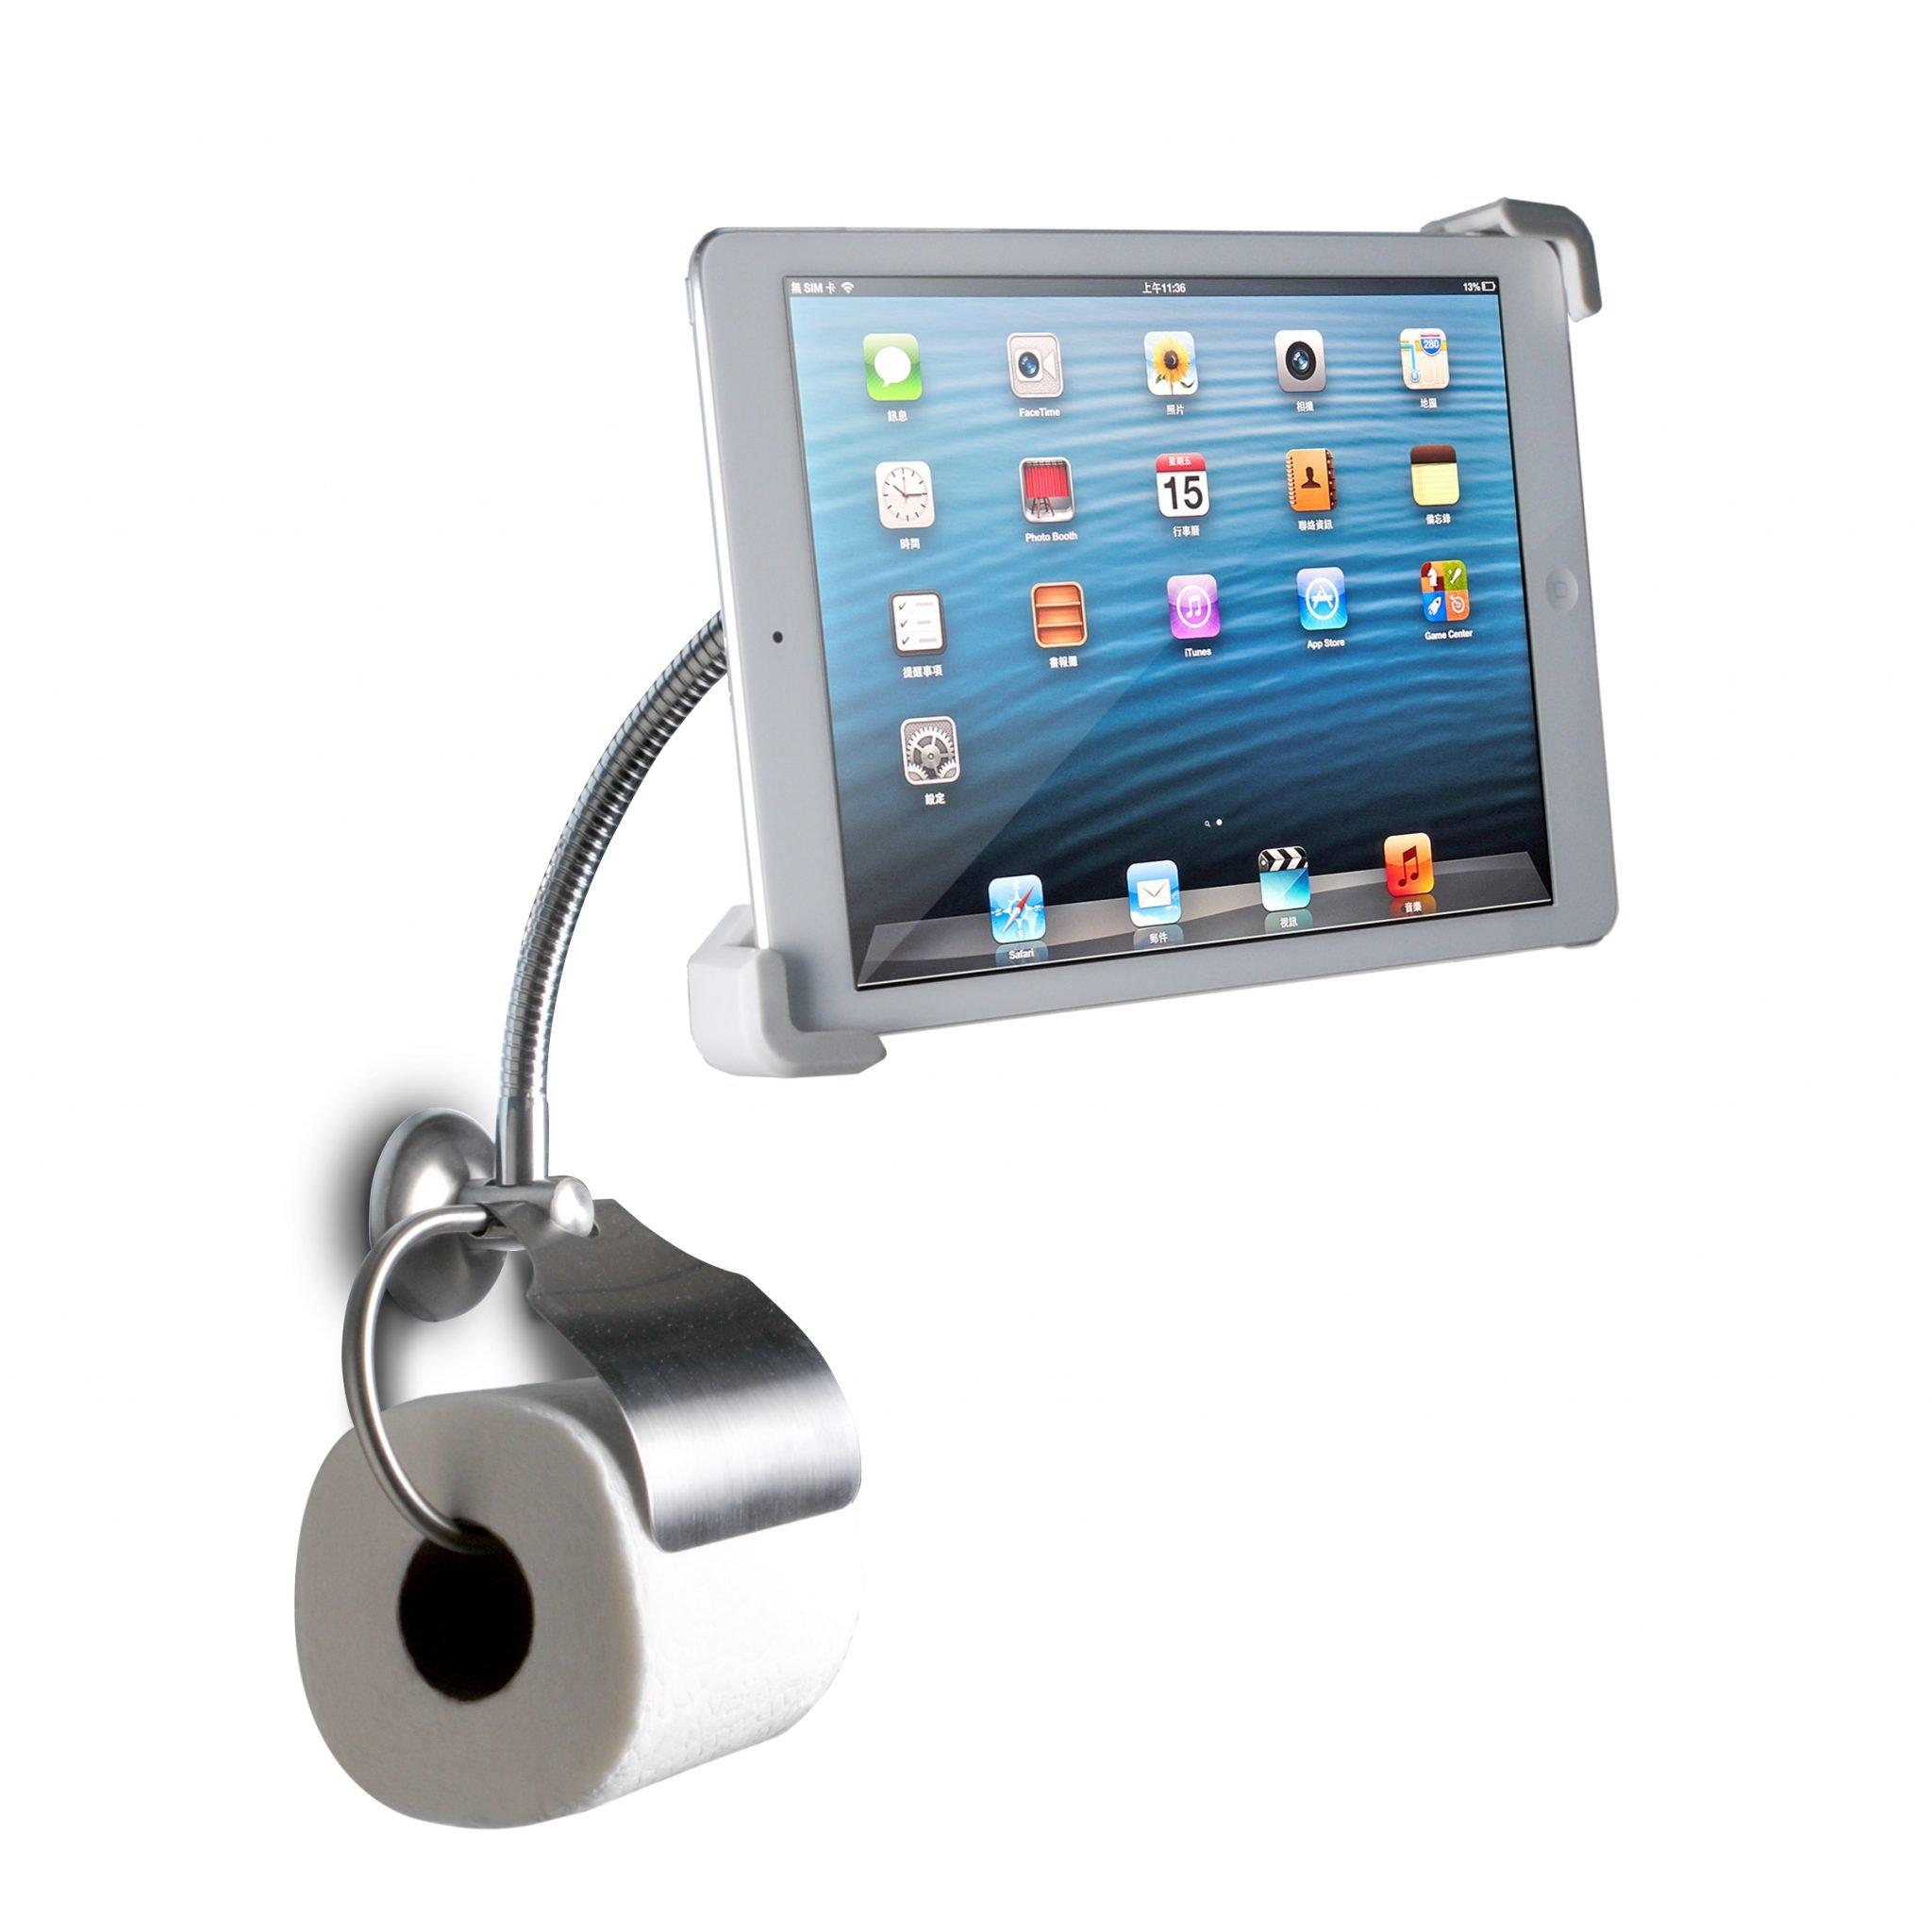 iPad Toiler Paper Holder